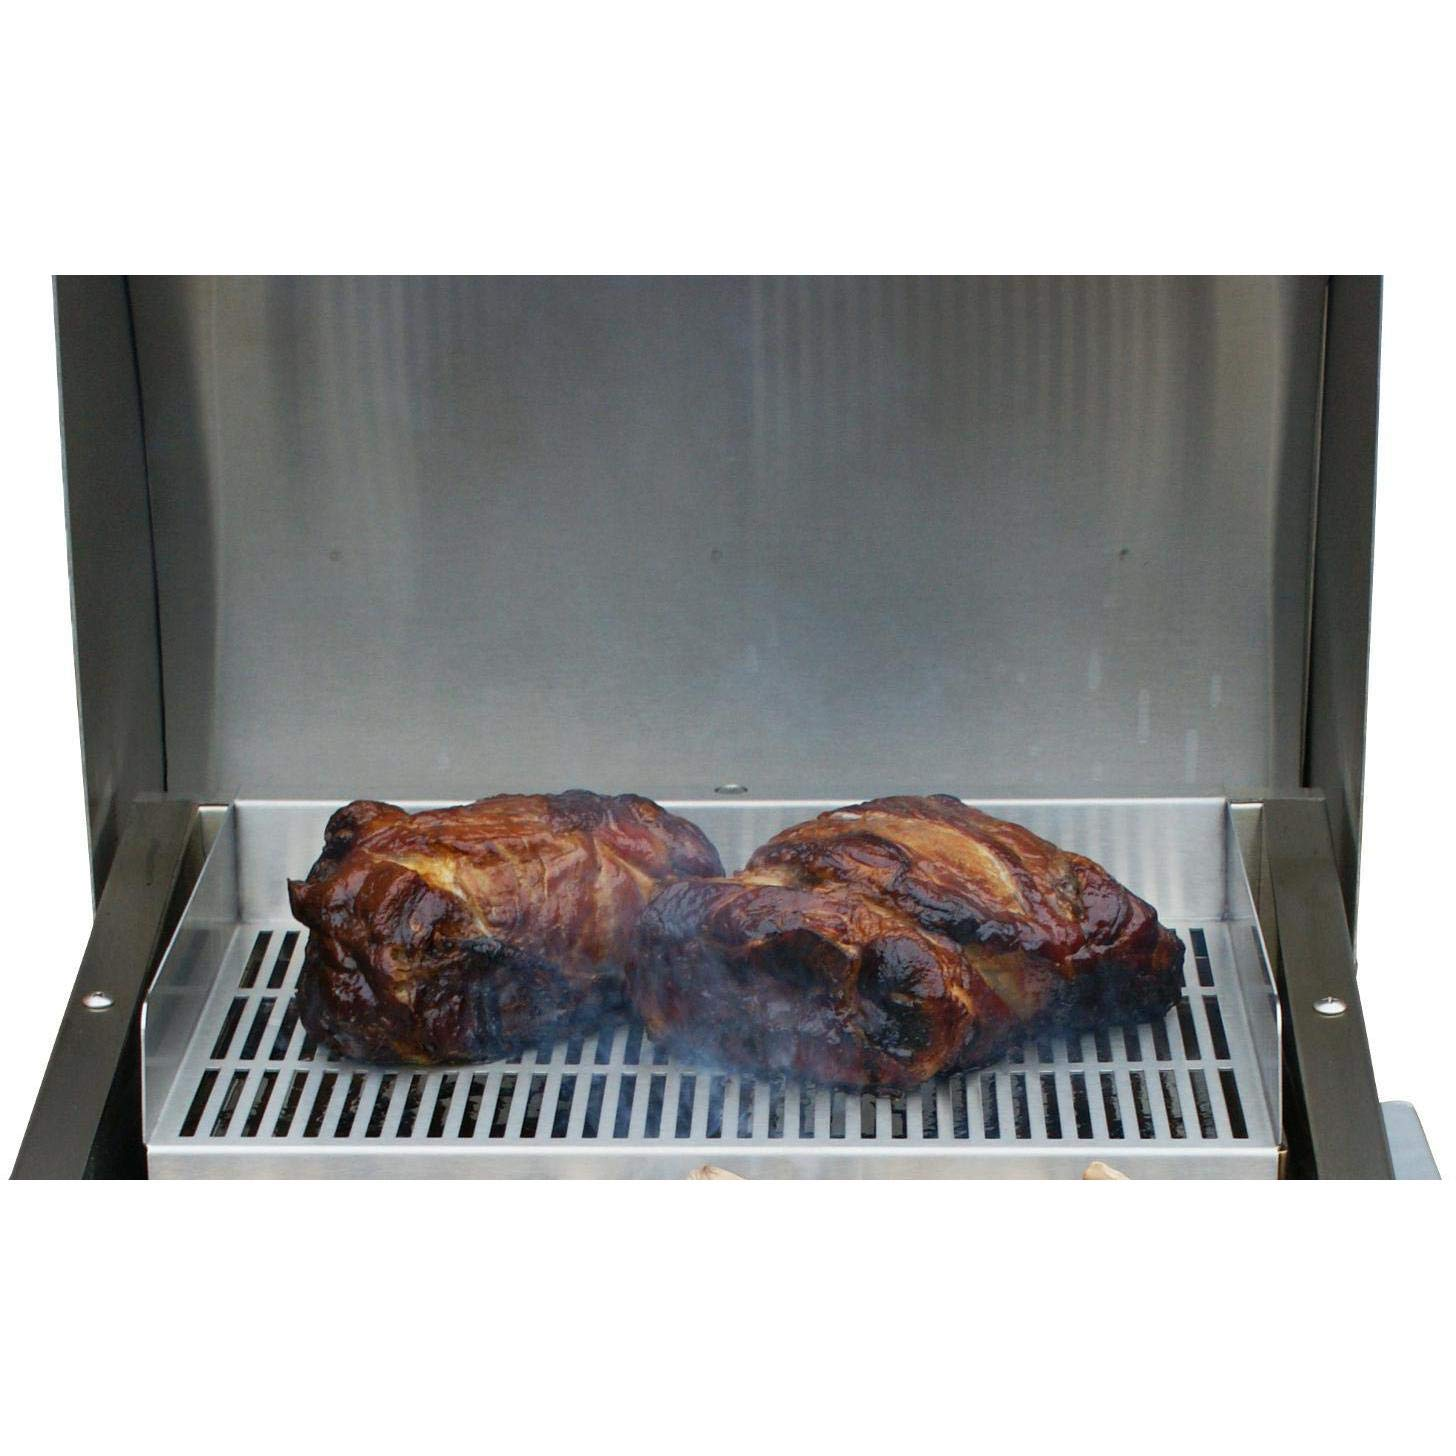 TEC Infrared Smoker/Roaster for G-Sport Grills (GSRSMKR)